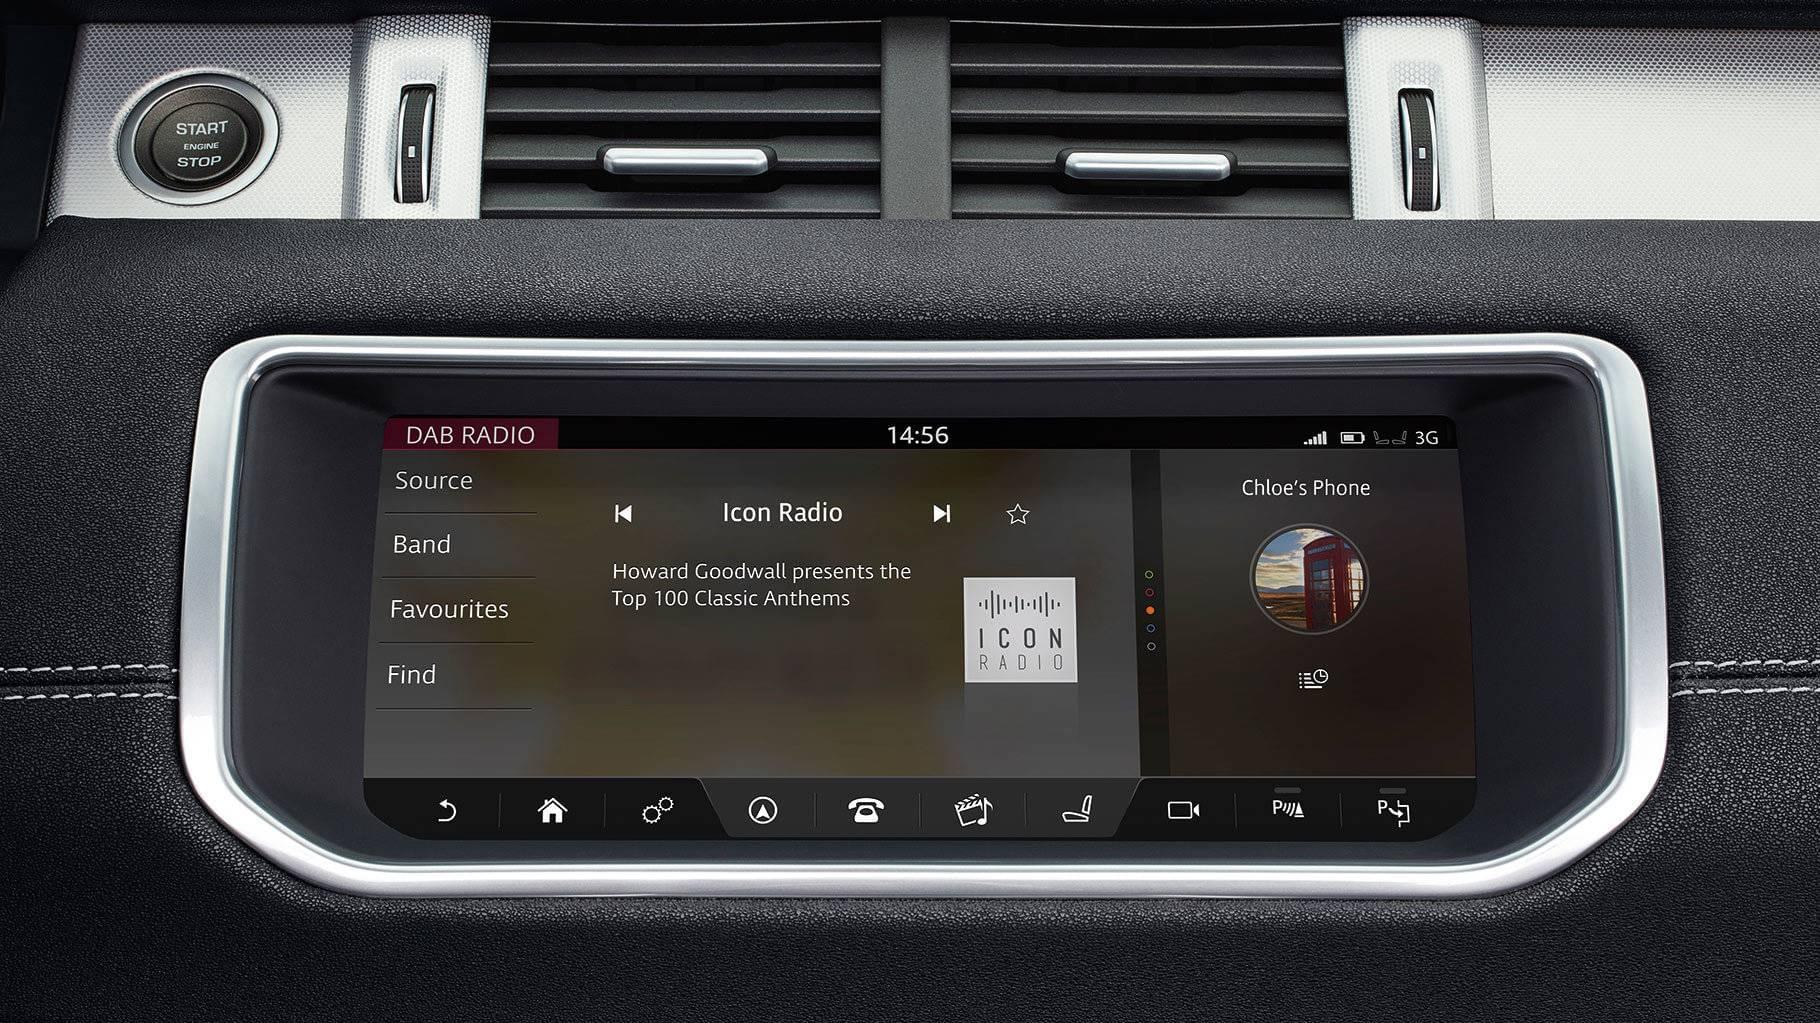 2017-Land-Rover-Range-Rover-Evoque-Technology-Features